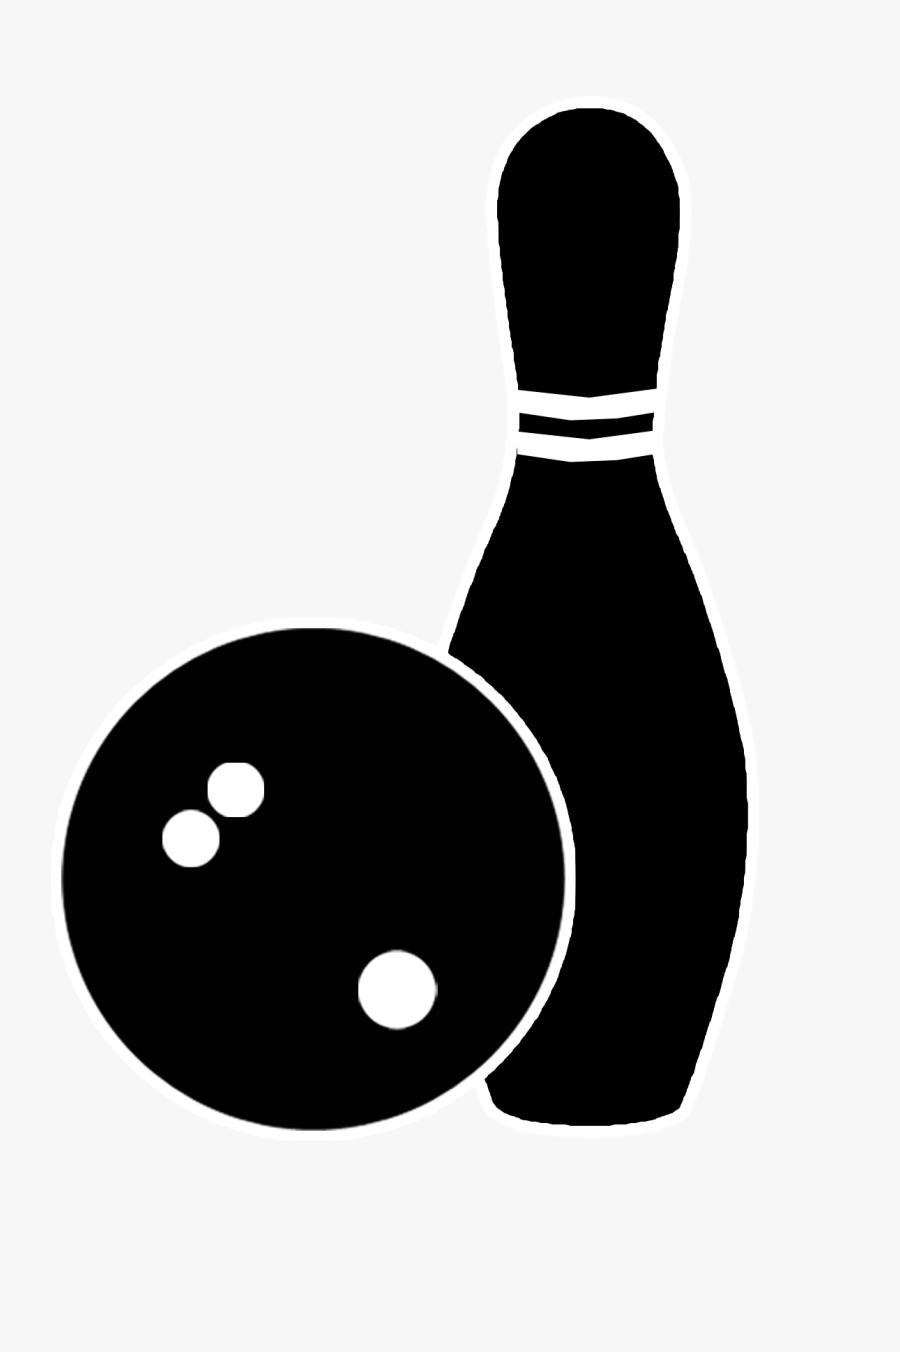 Transparent Bowling Clipart - Black Bowling Pins Png, Transparent Clipart